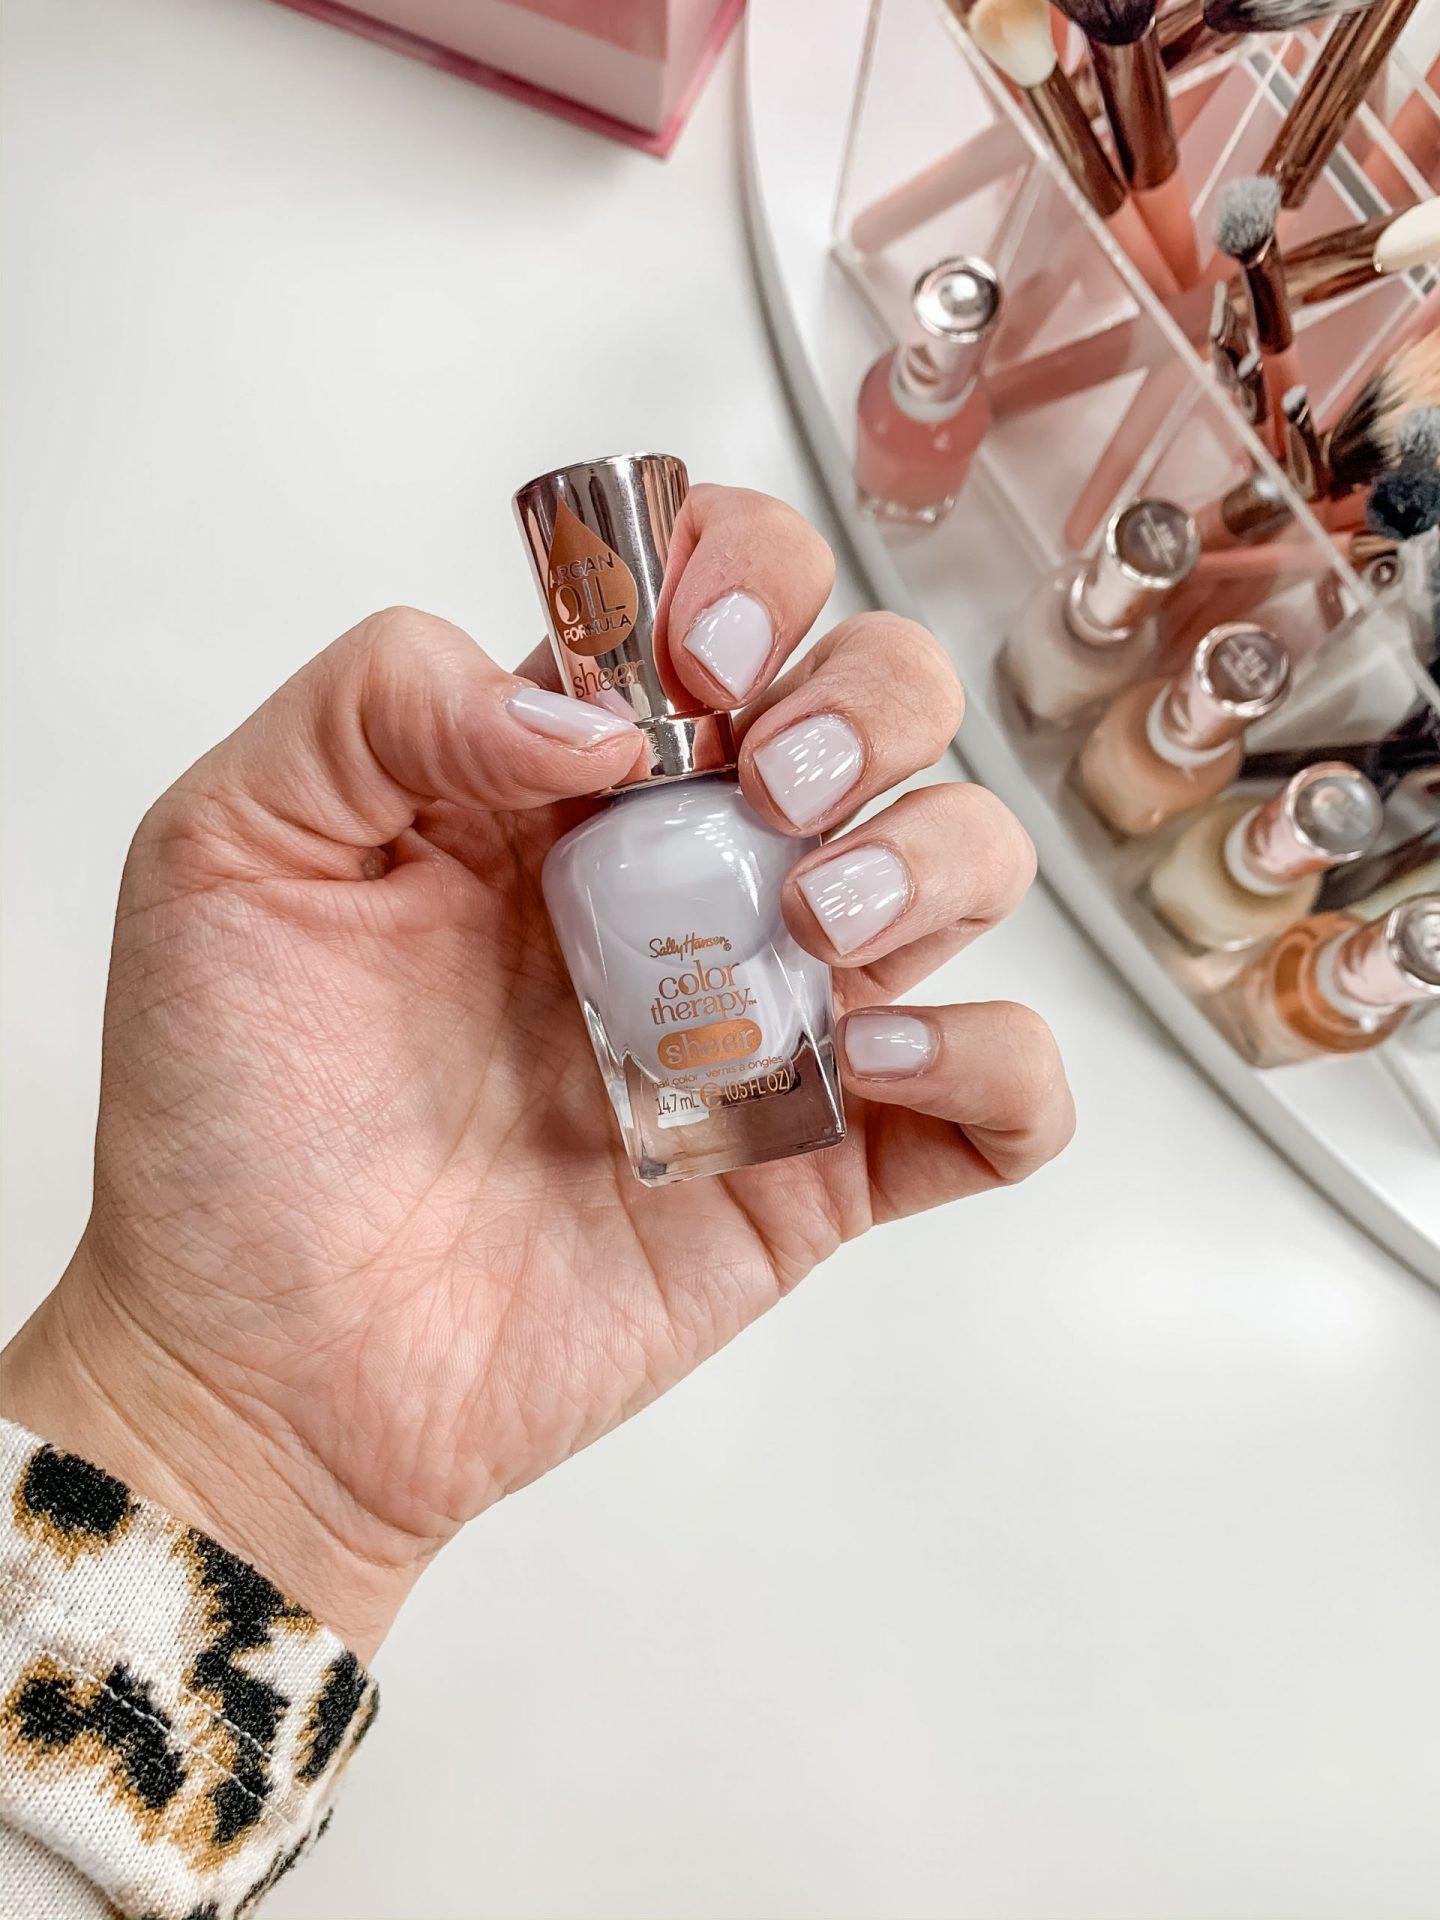 Spring Nail Colors // Summer Nail Colors // Fun Nail Colors for Spring // Spring Manicure // Gel Polish // Pretty Nail Colors | Beauty With Lily #nailpolish #springnailcolors